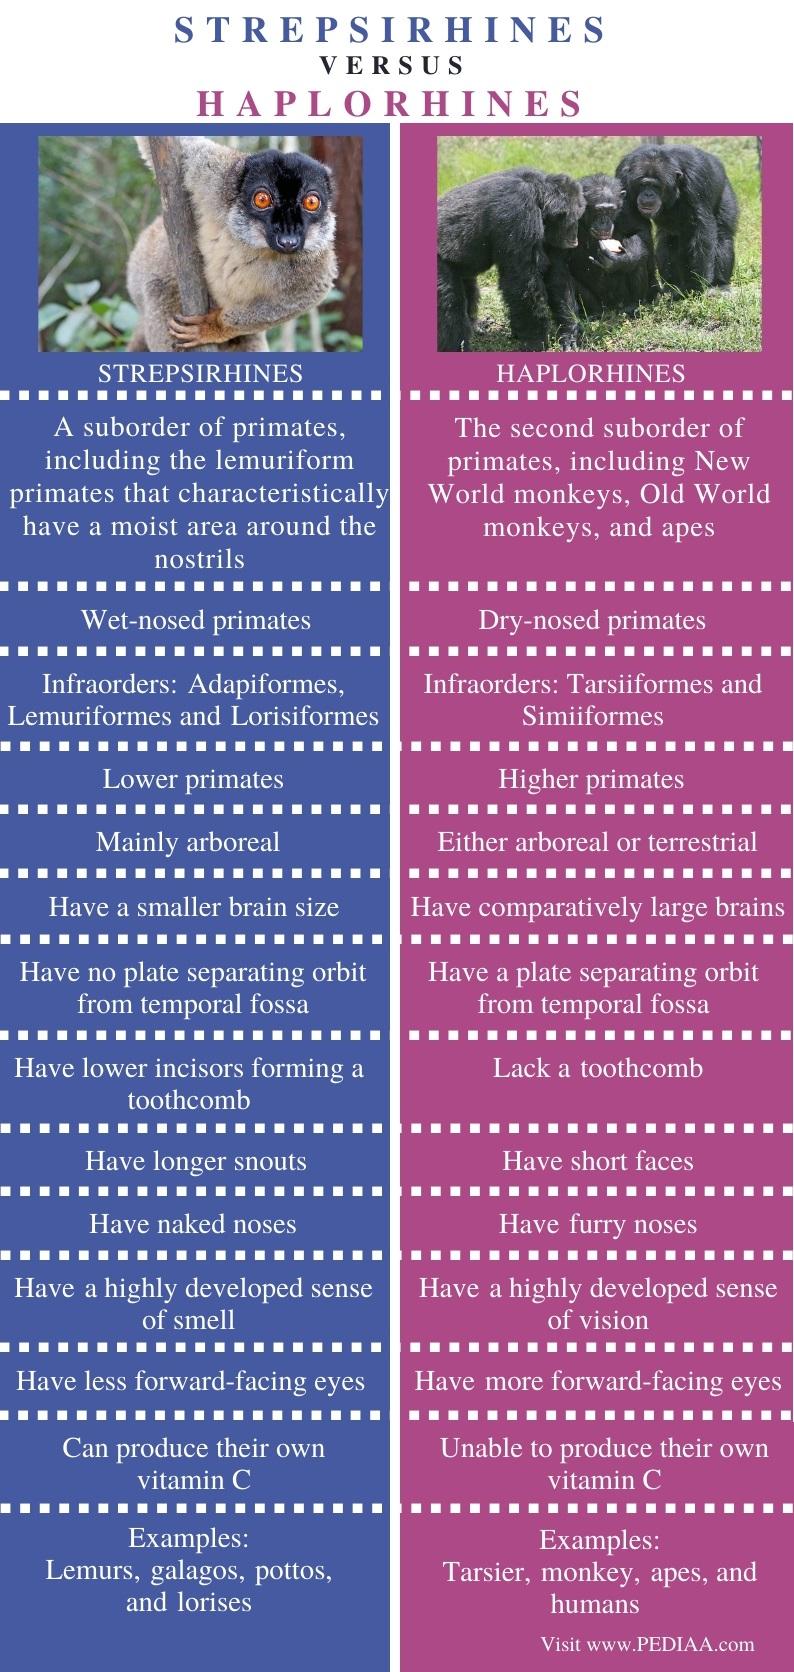 Difference Between Strepsirhines and Haplorhines - Comparison Summary